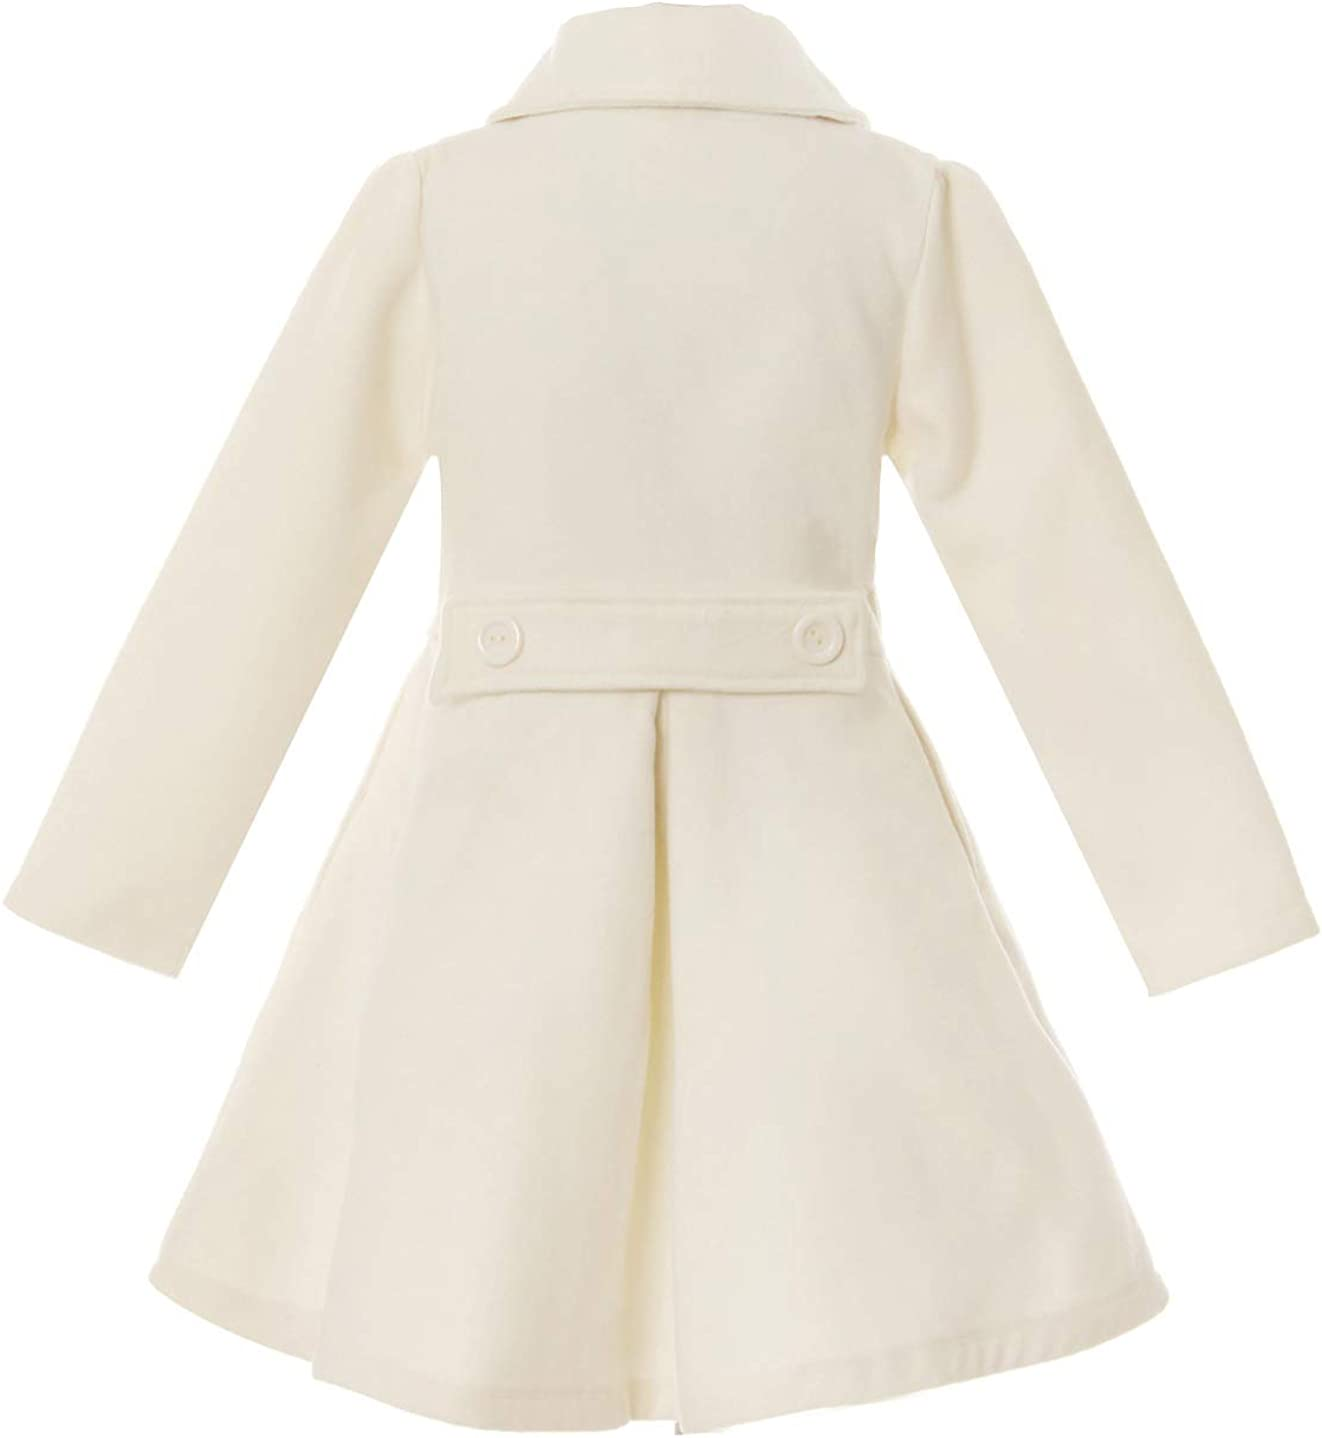 iGirlDress Coat Long Sleeve Button Pocket Long Winter Coat Outerwear